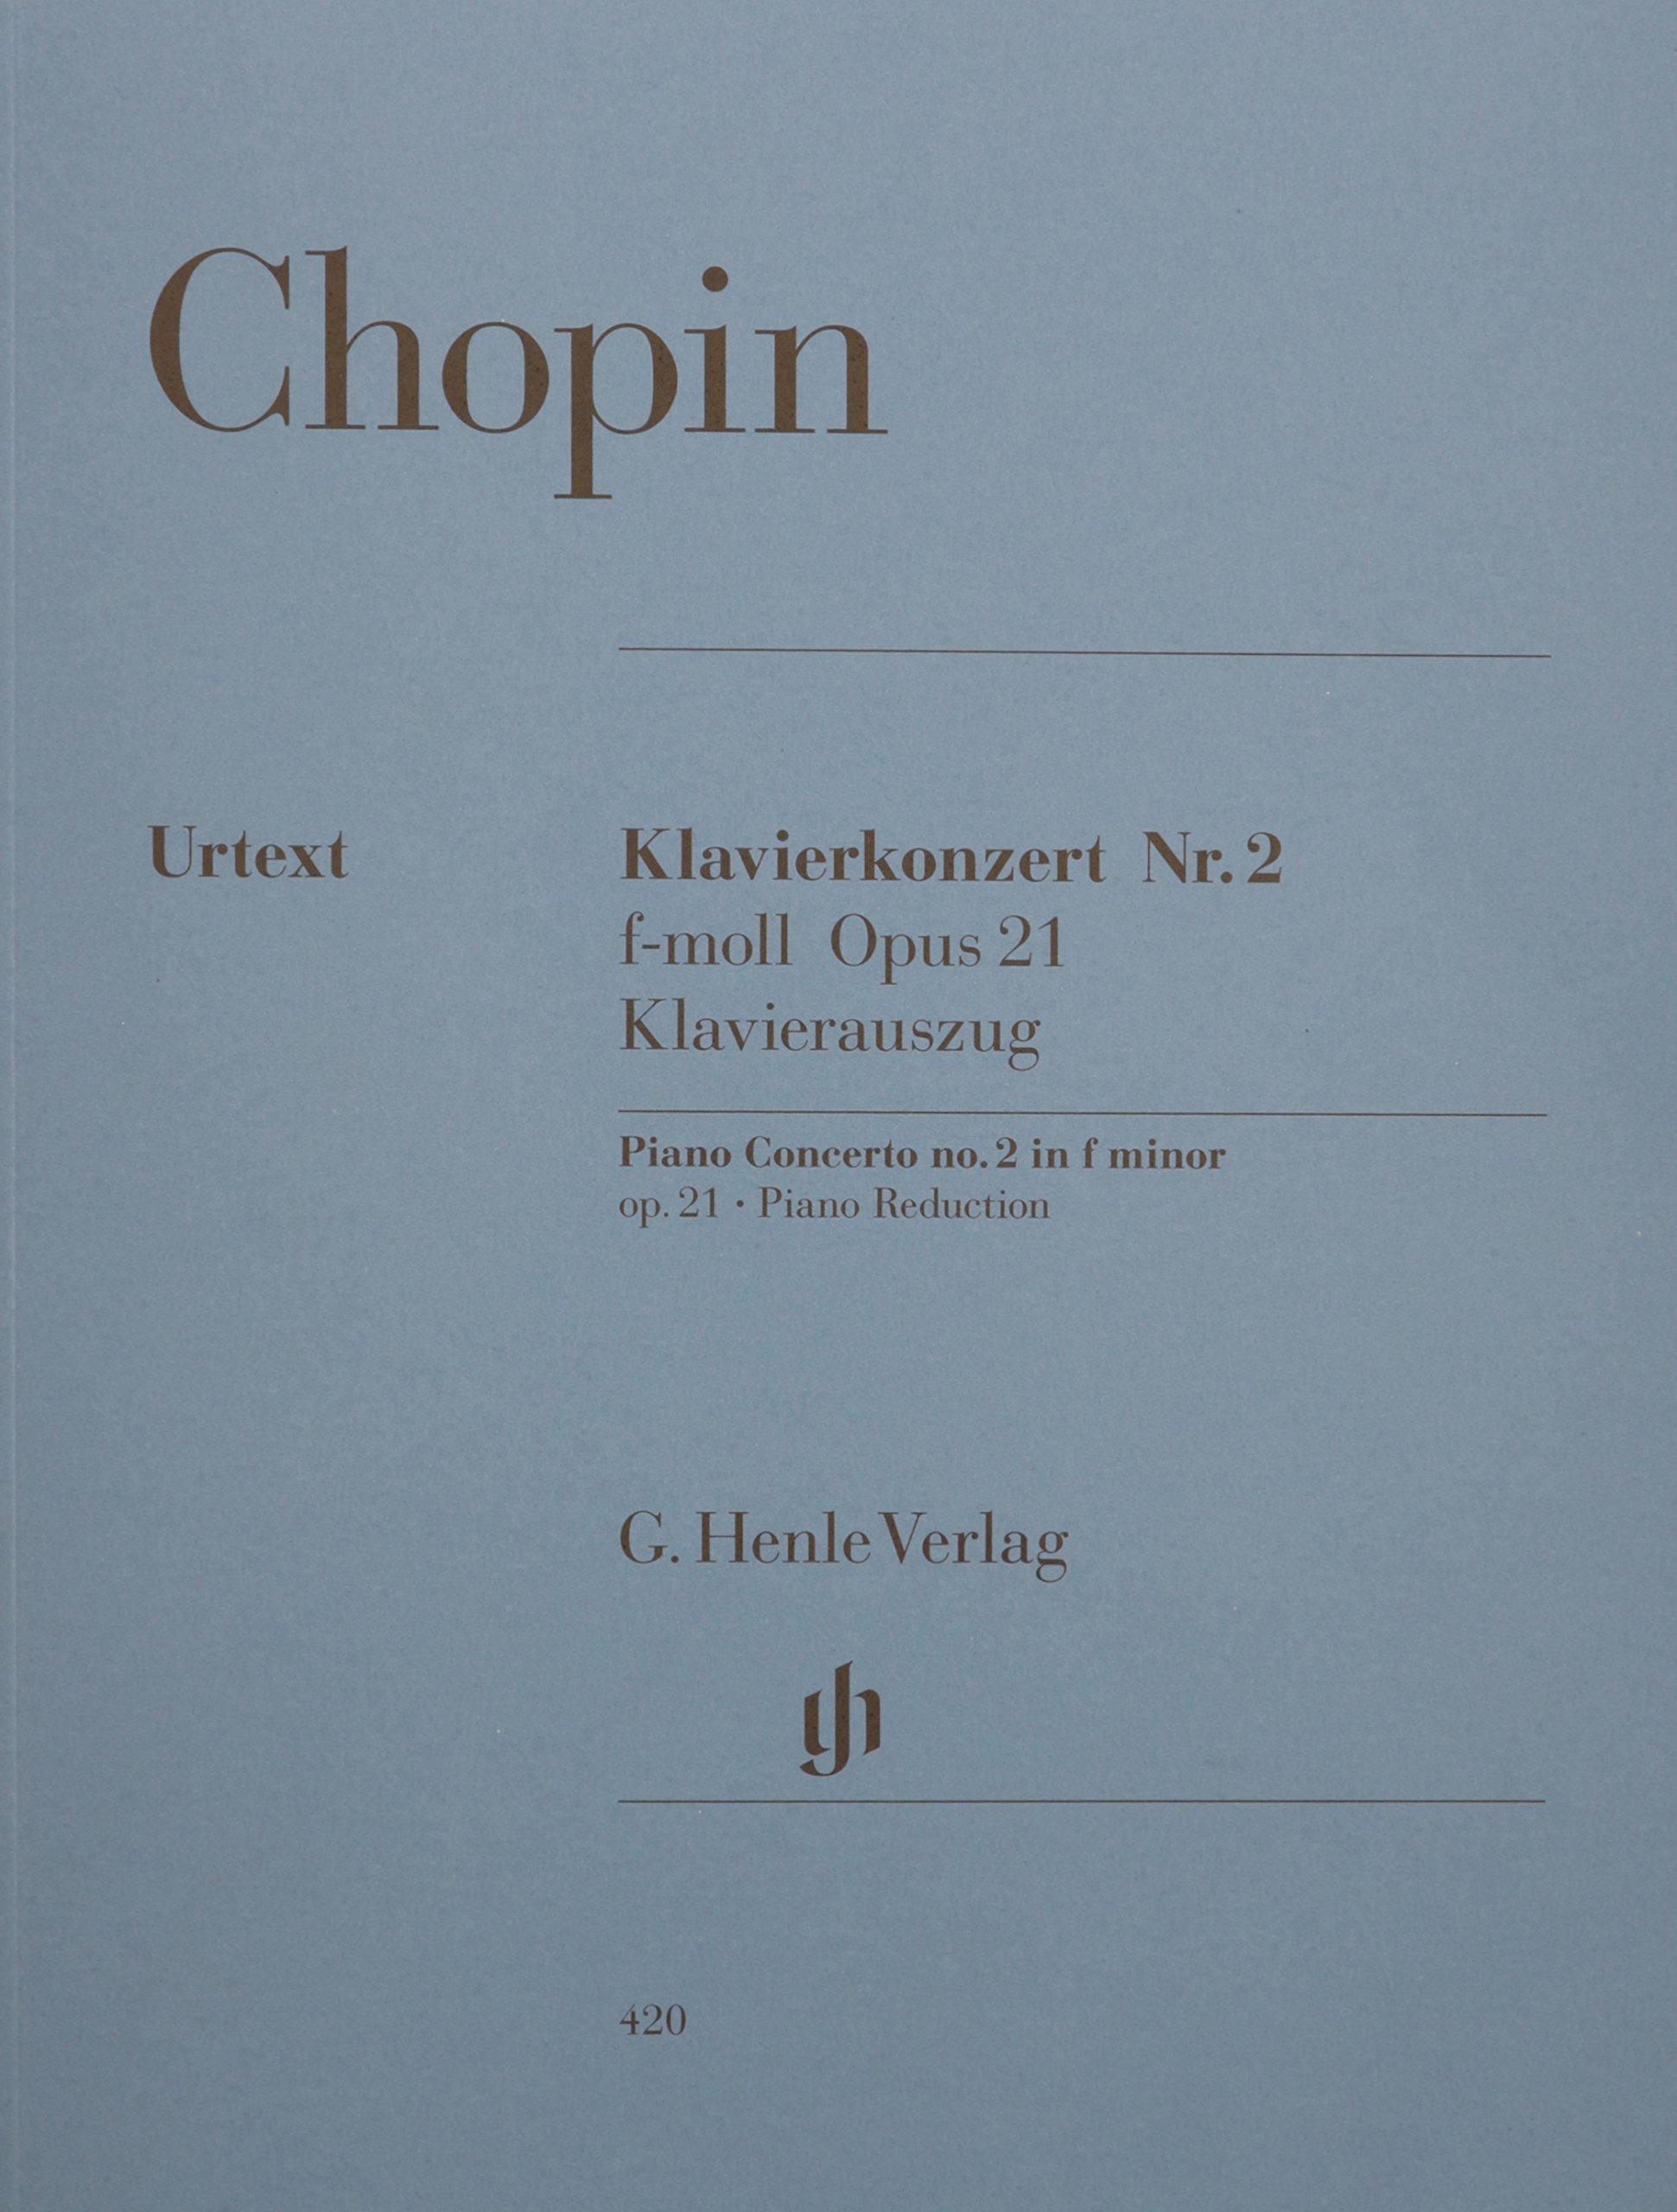 Concerto for Piano and Orchestra F minor Op. 21, No. 2 pdf